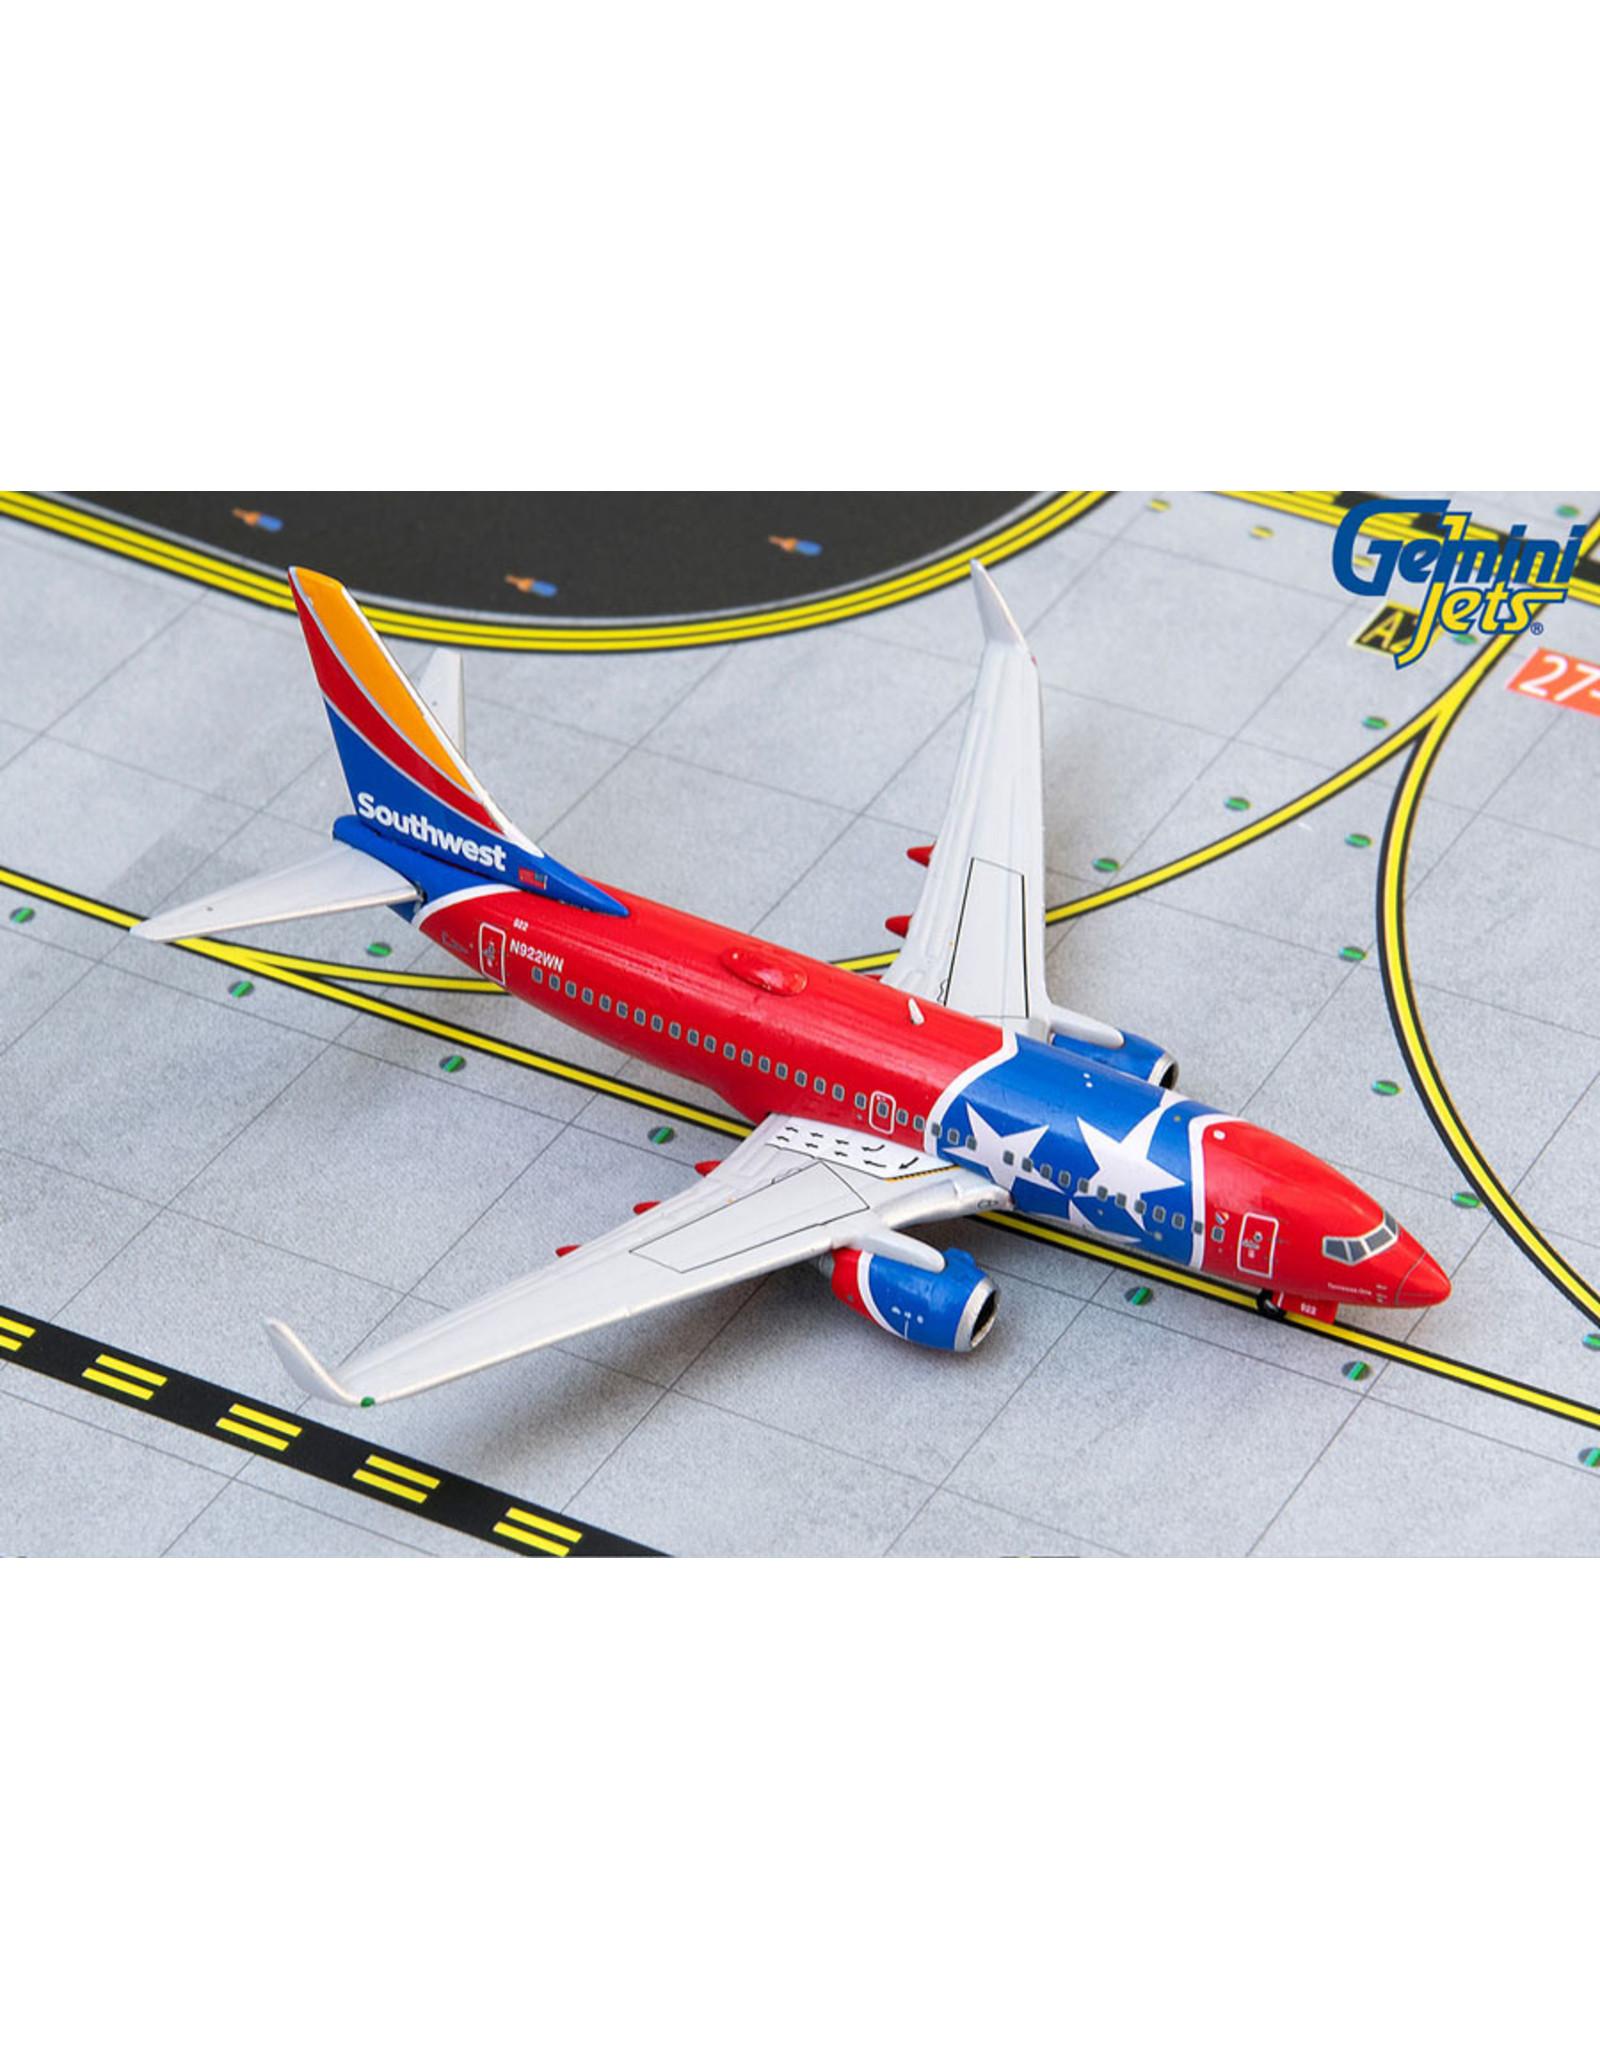 Gem4 Southwest 737-700 Tennessee One